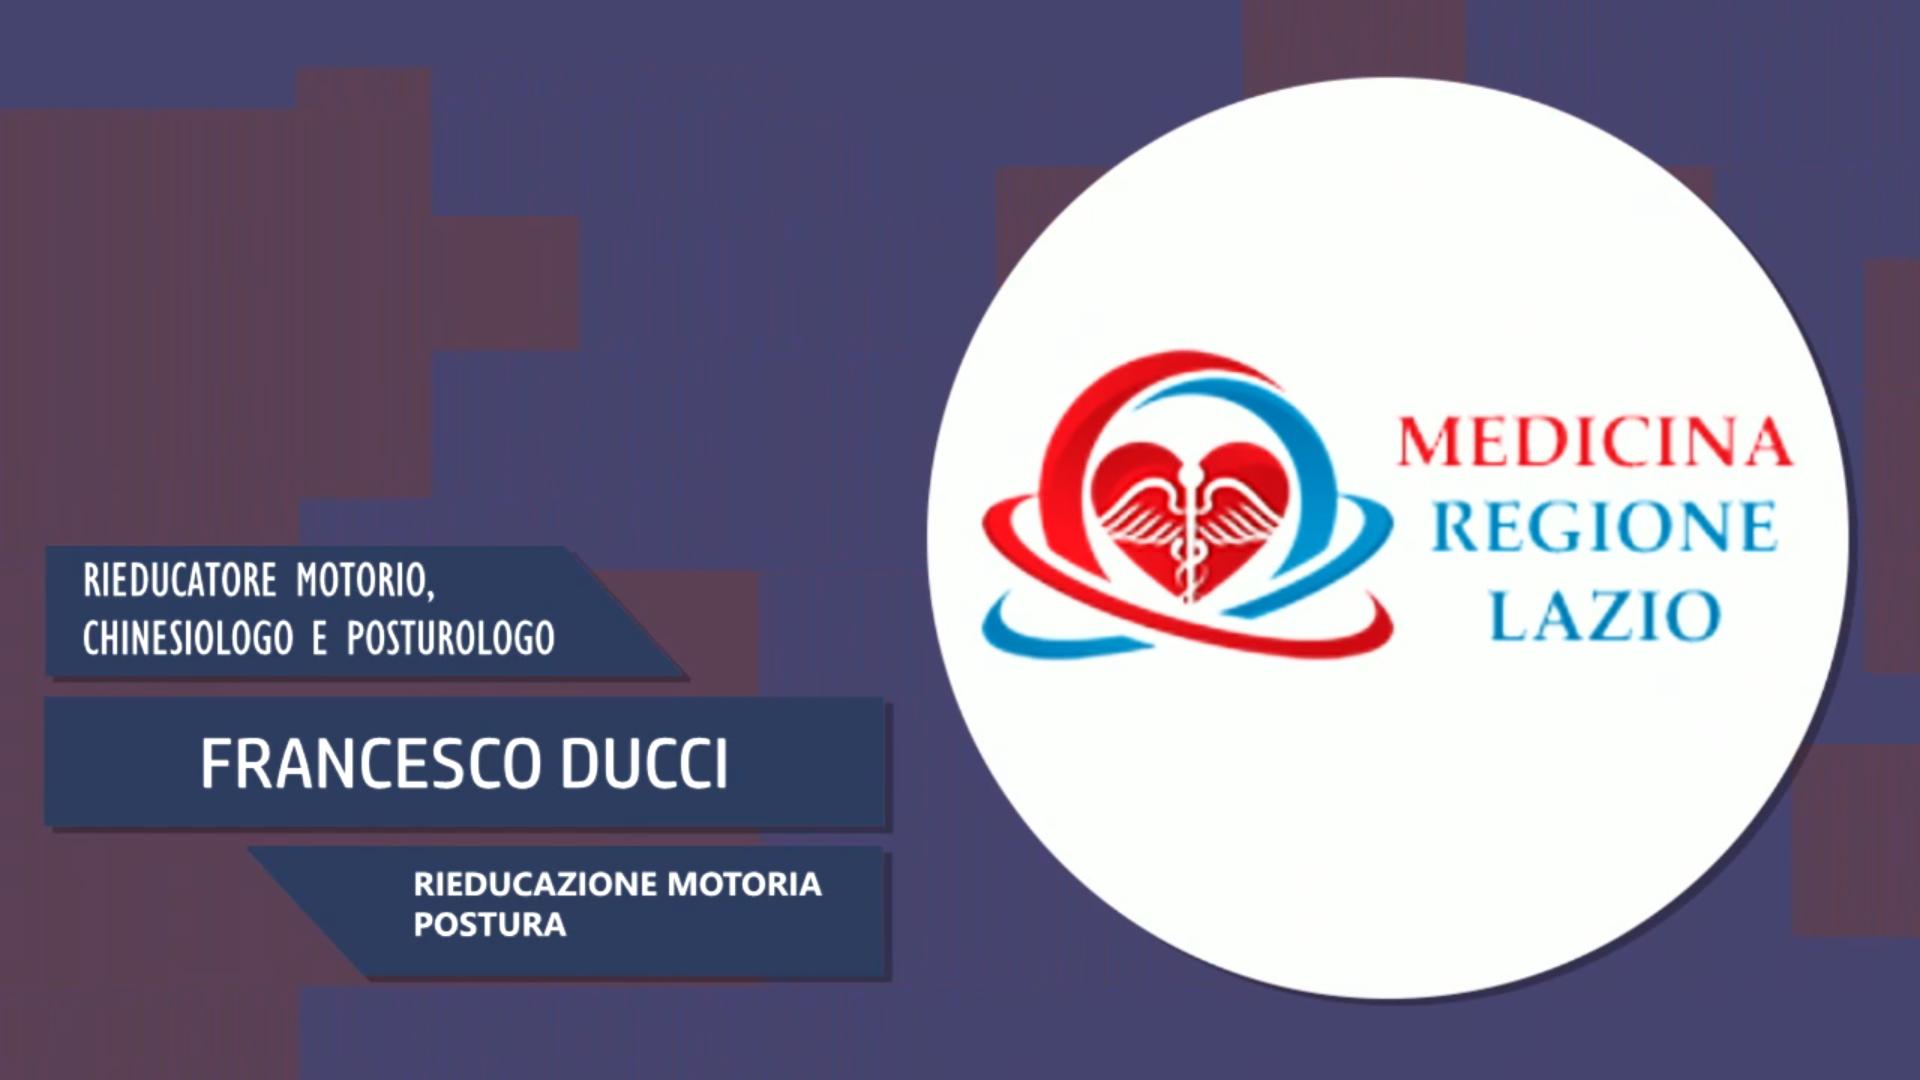 Intervista a Francesco Ducci – Rieducazione motoria postura